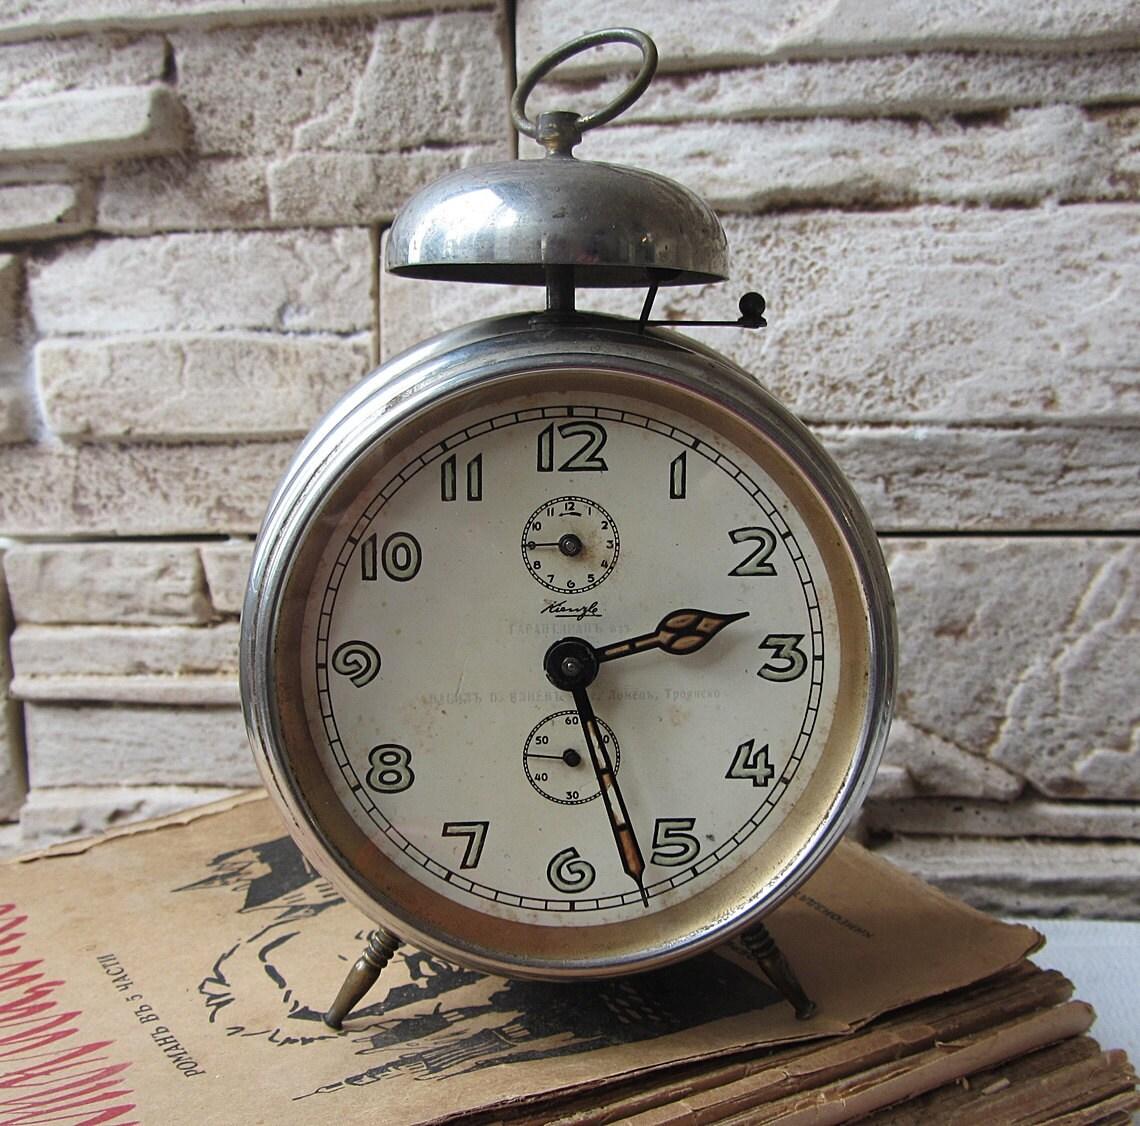 German vintage alarm clock KienzleWorking Antique German